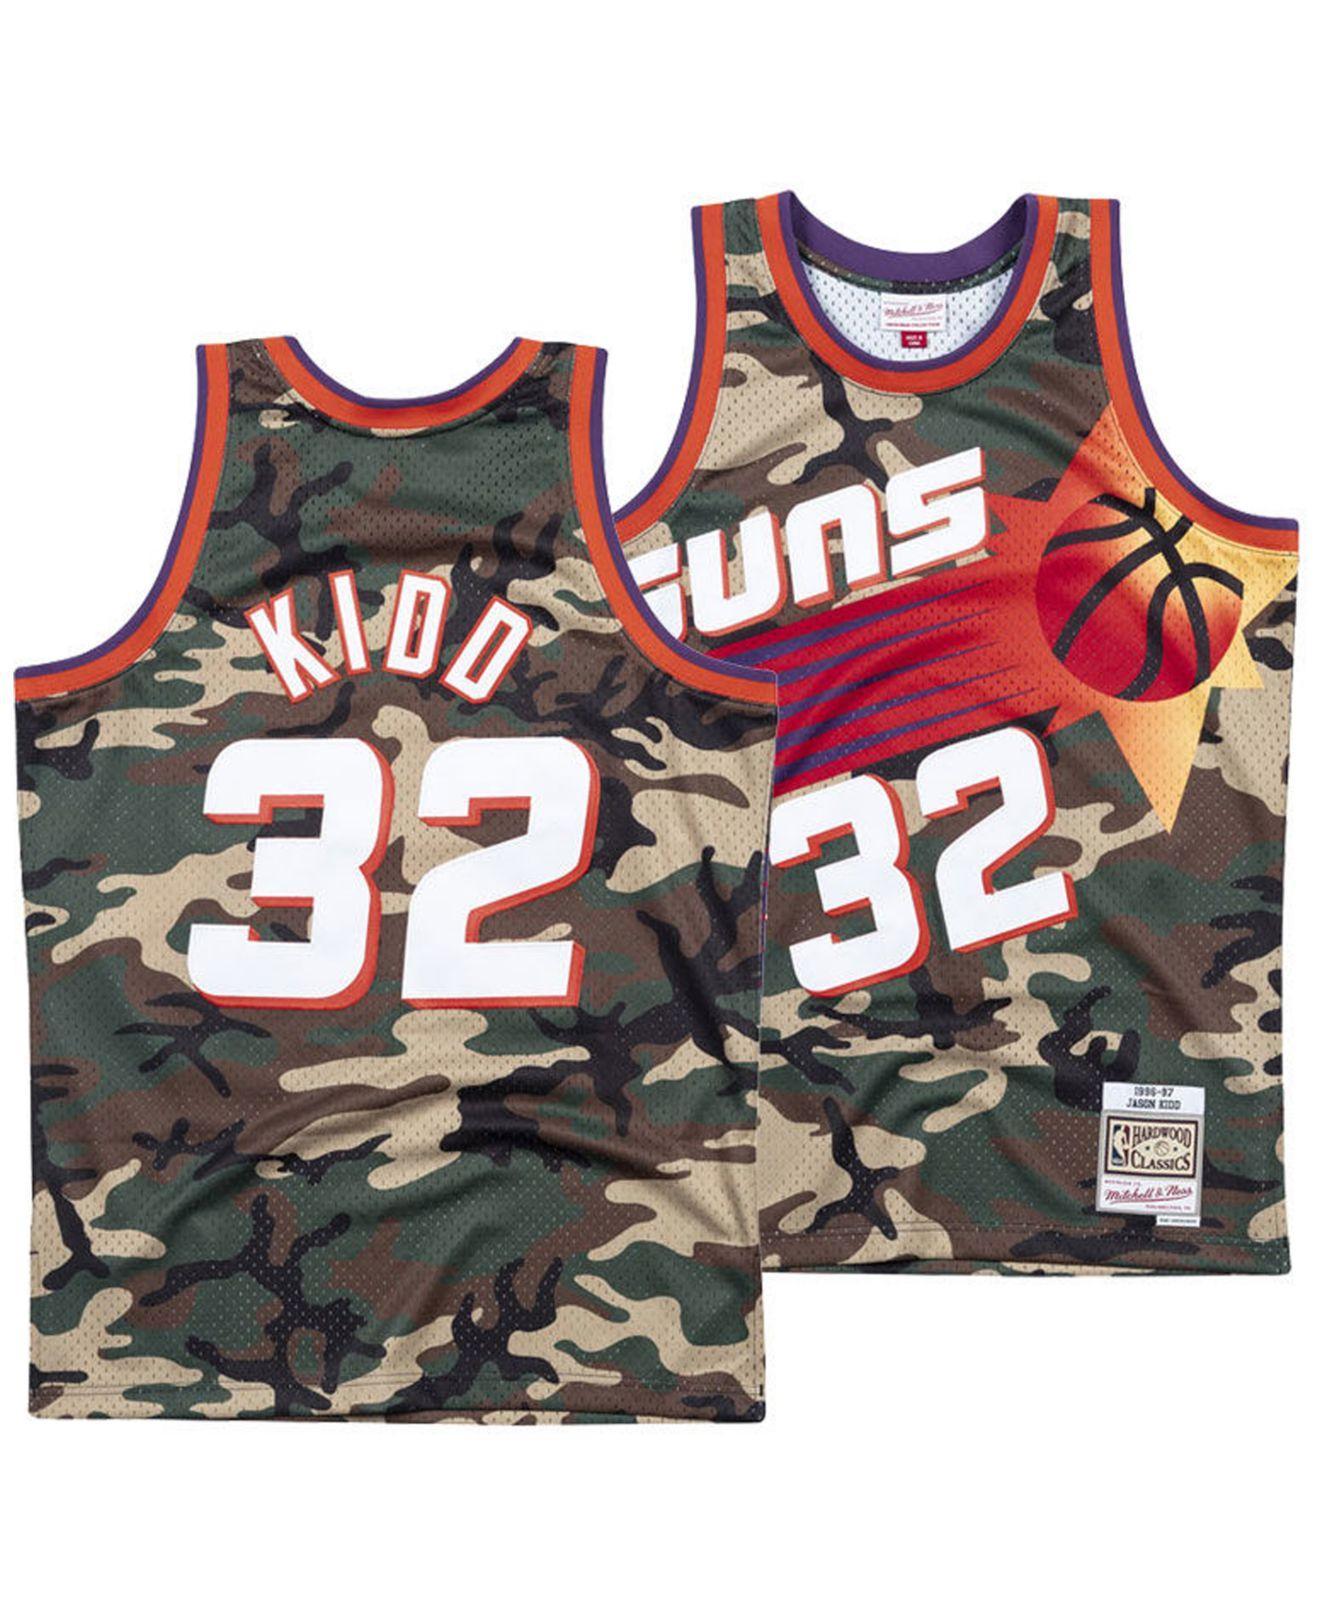 f623ca72f3d Mitchell   Ness Jersey Jason Kidd Phoenix Suns Woodland Camo ...